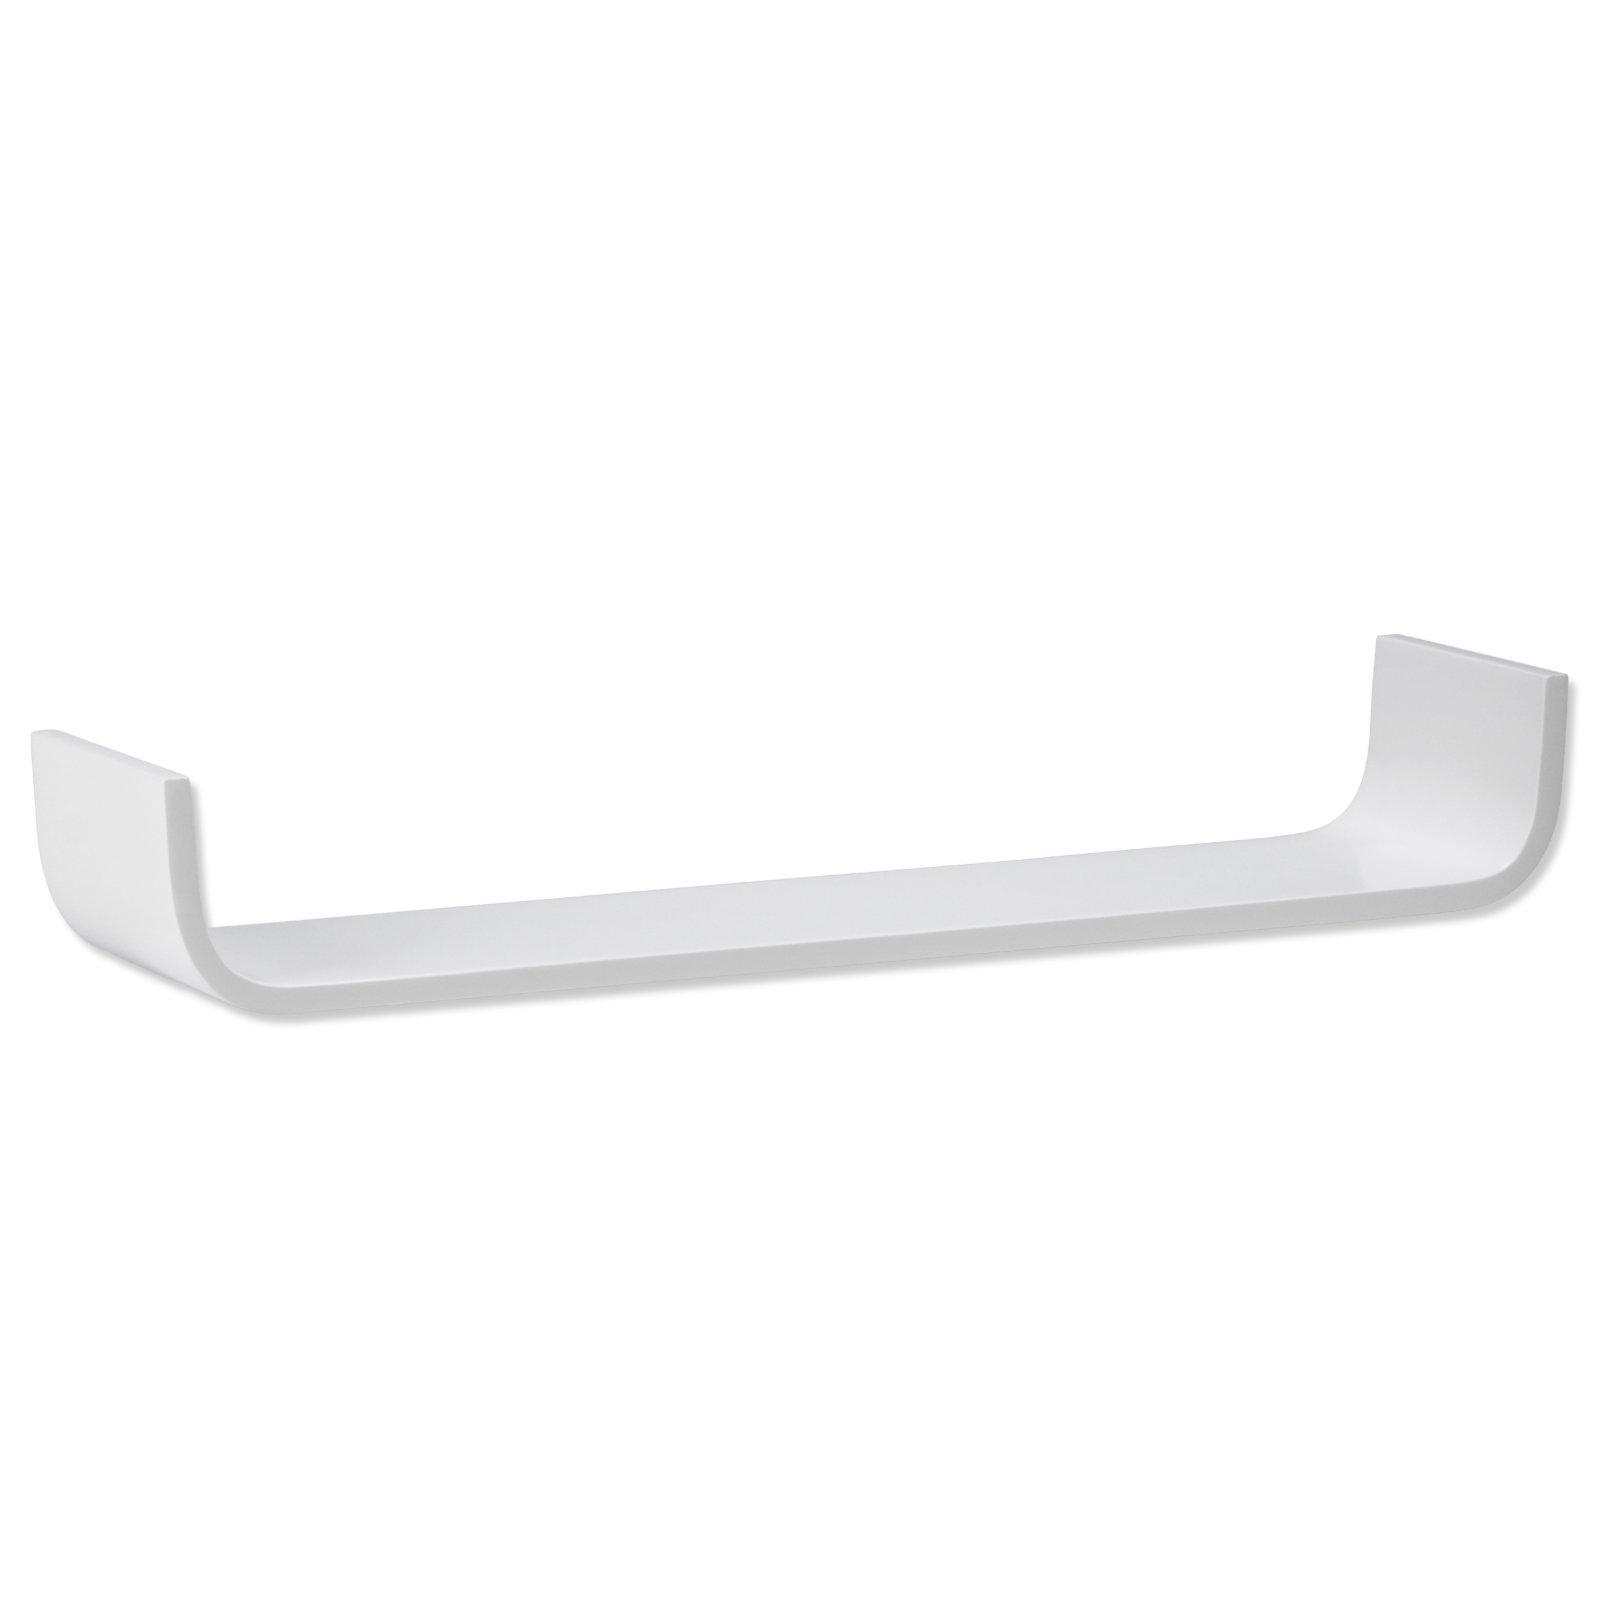 wandregal wei u form 79 5 cm breit wandregale boards regale m bel m belhaus roller. Black Bedroom Furniture Sets. Home Design Ideas